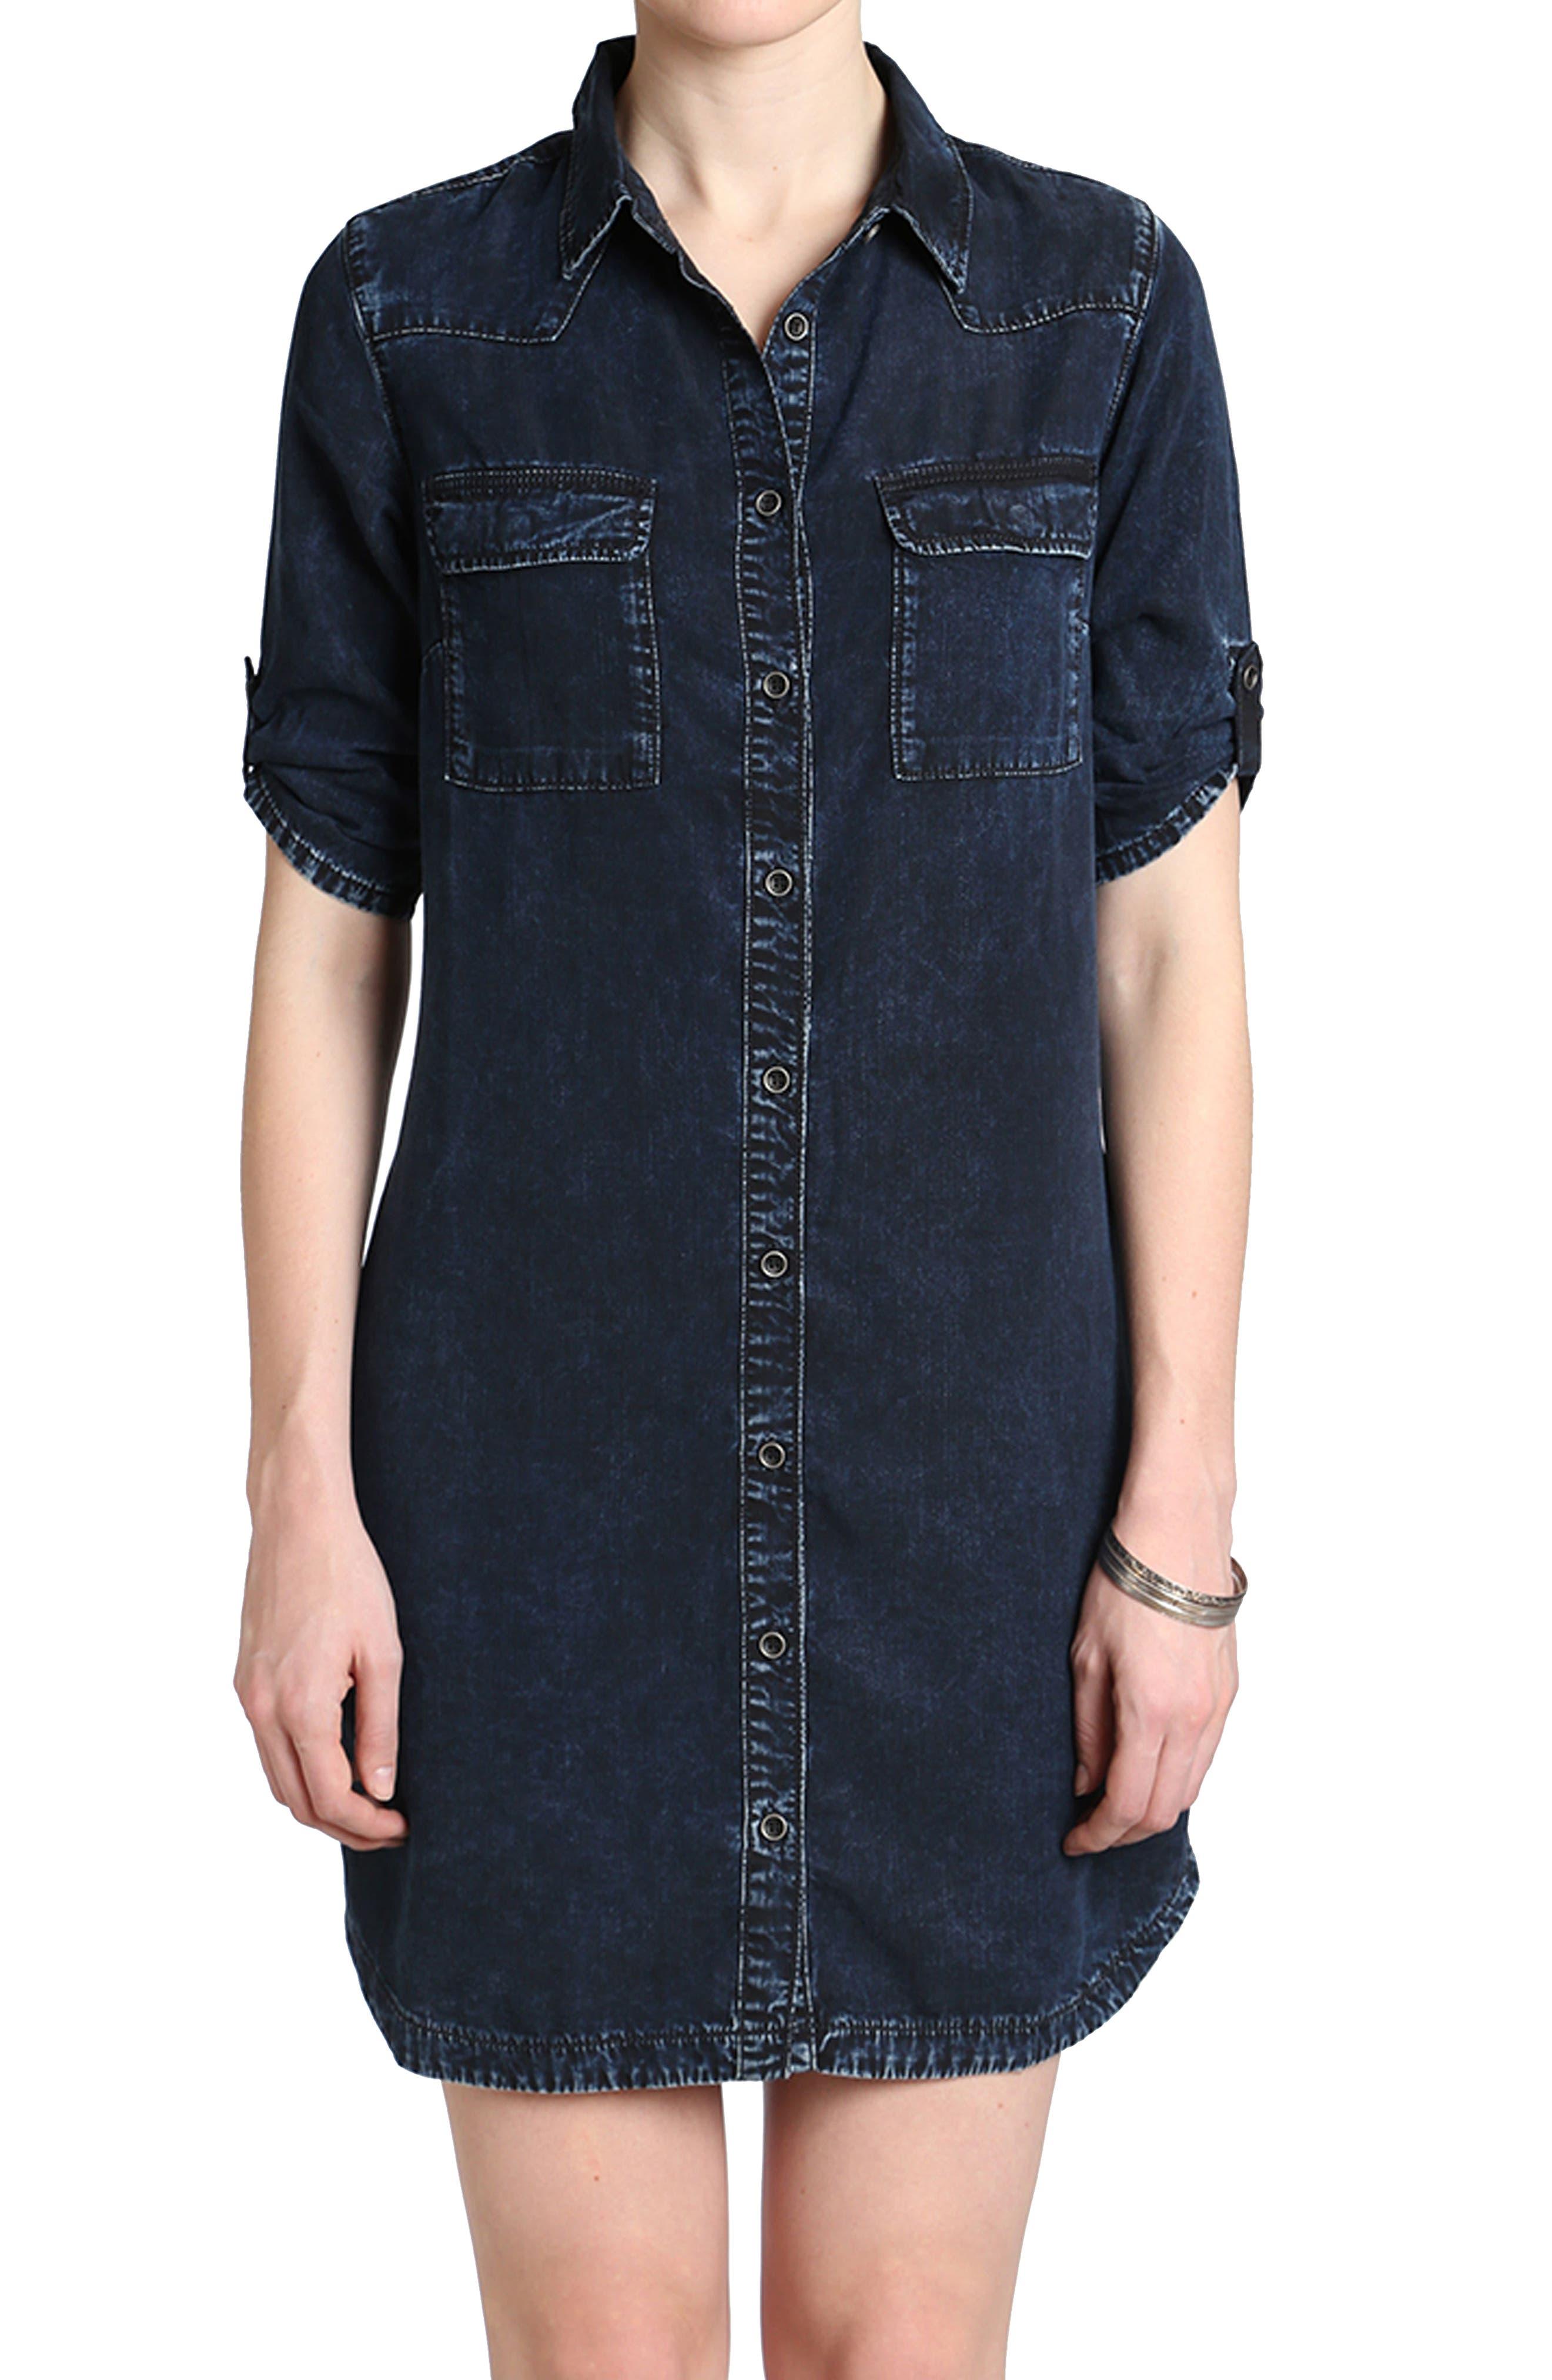 Mavi Jeans Bree Denim Shirtdress